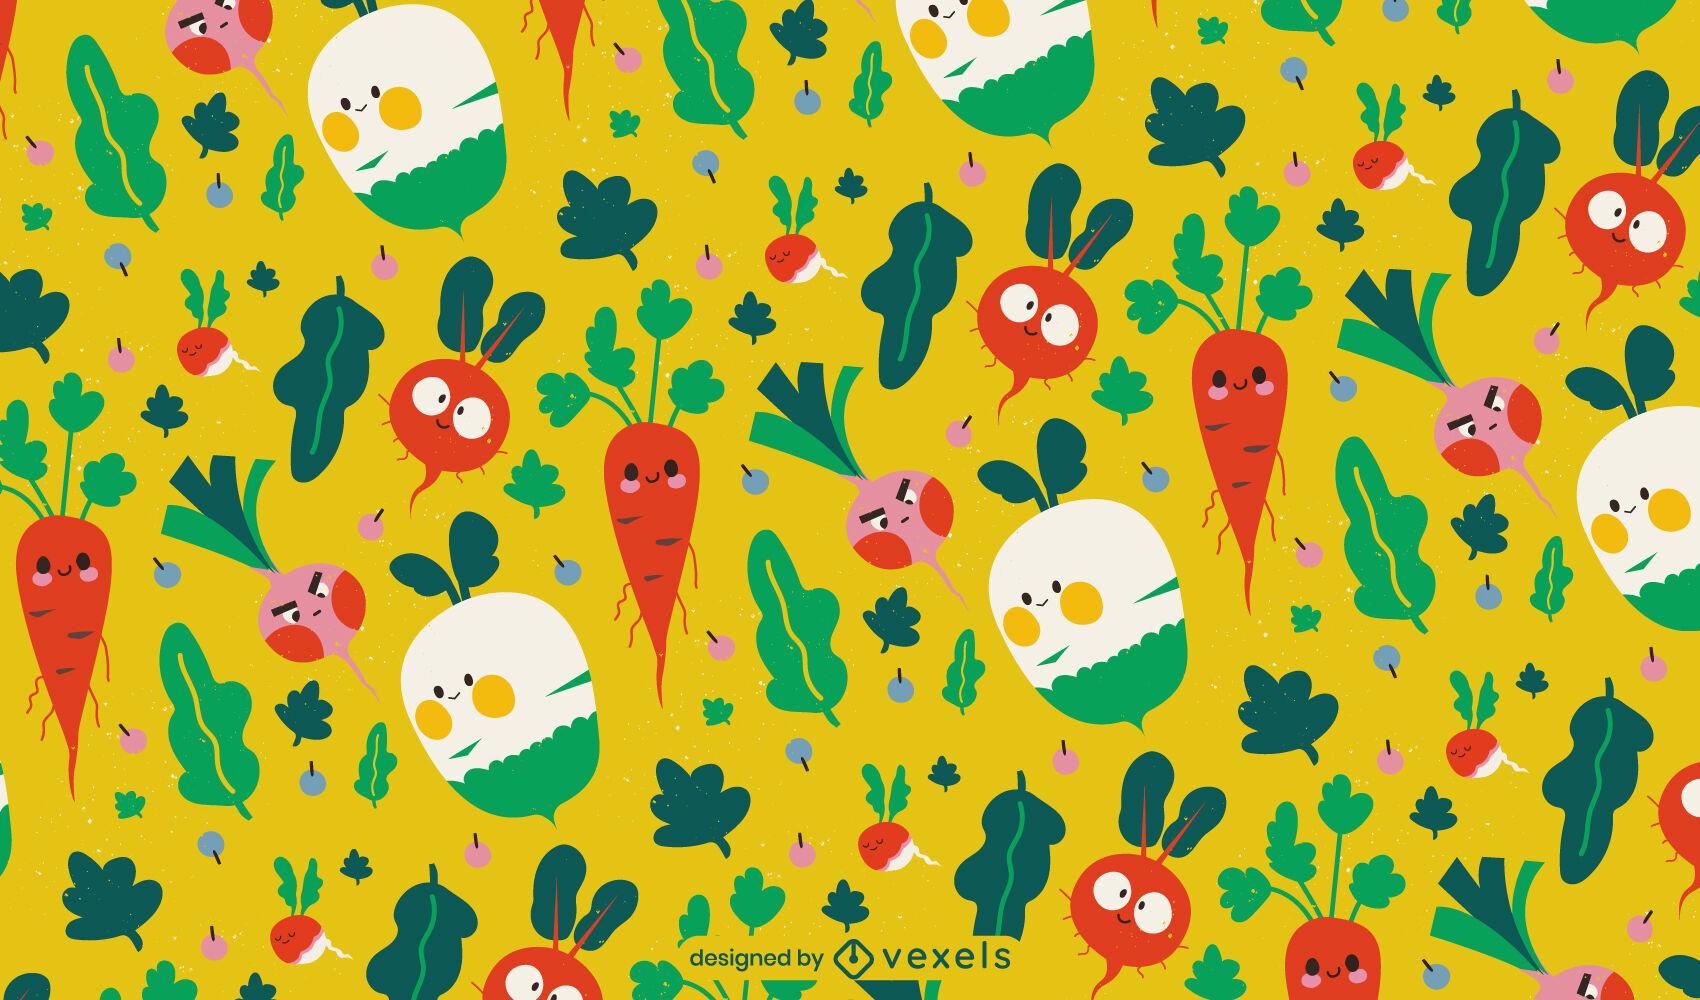 Vegetable food cartoon pattern design